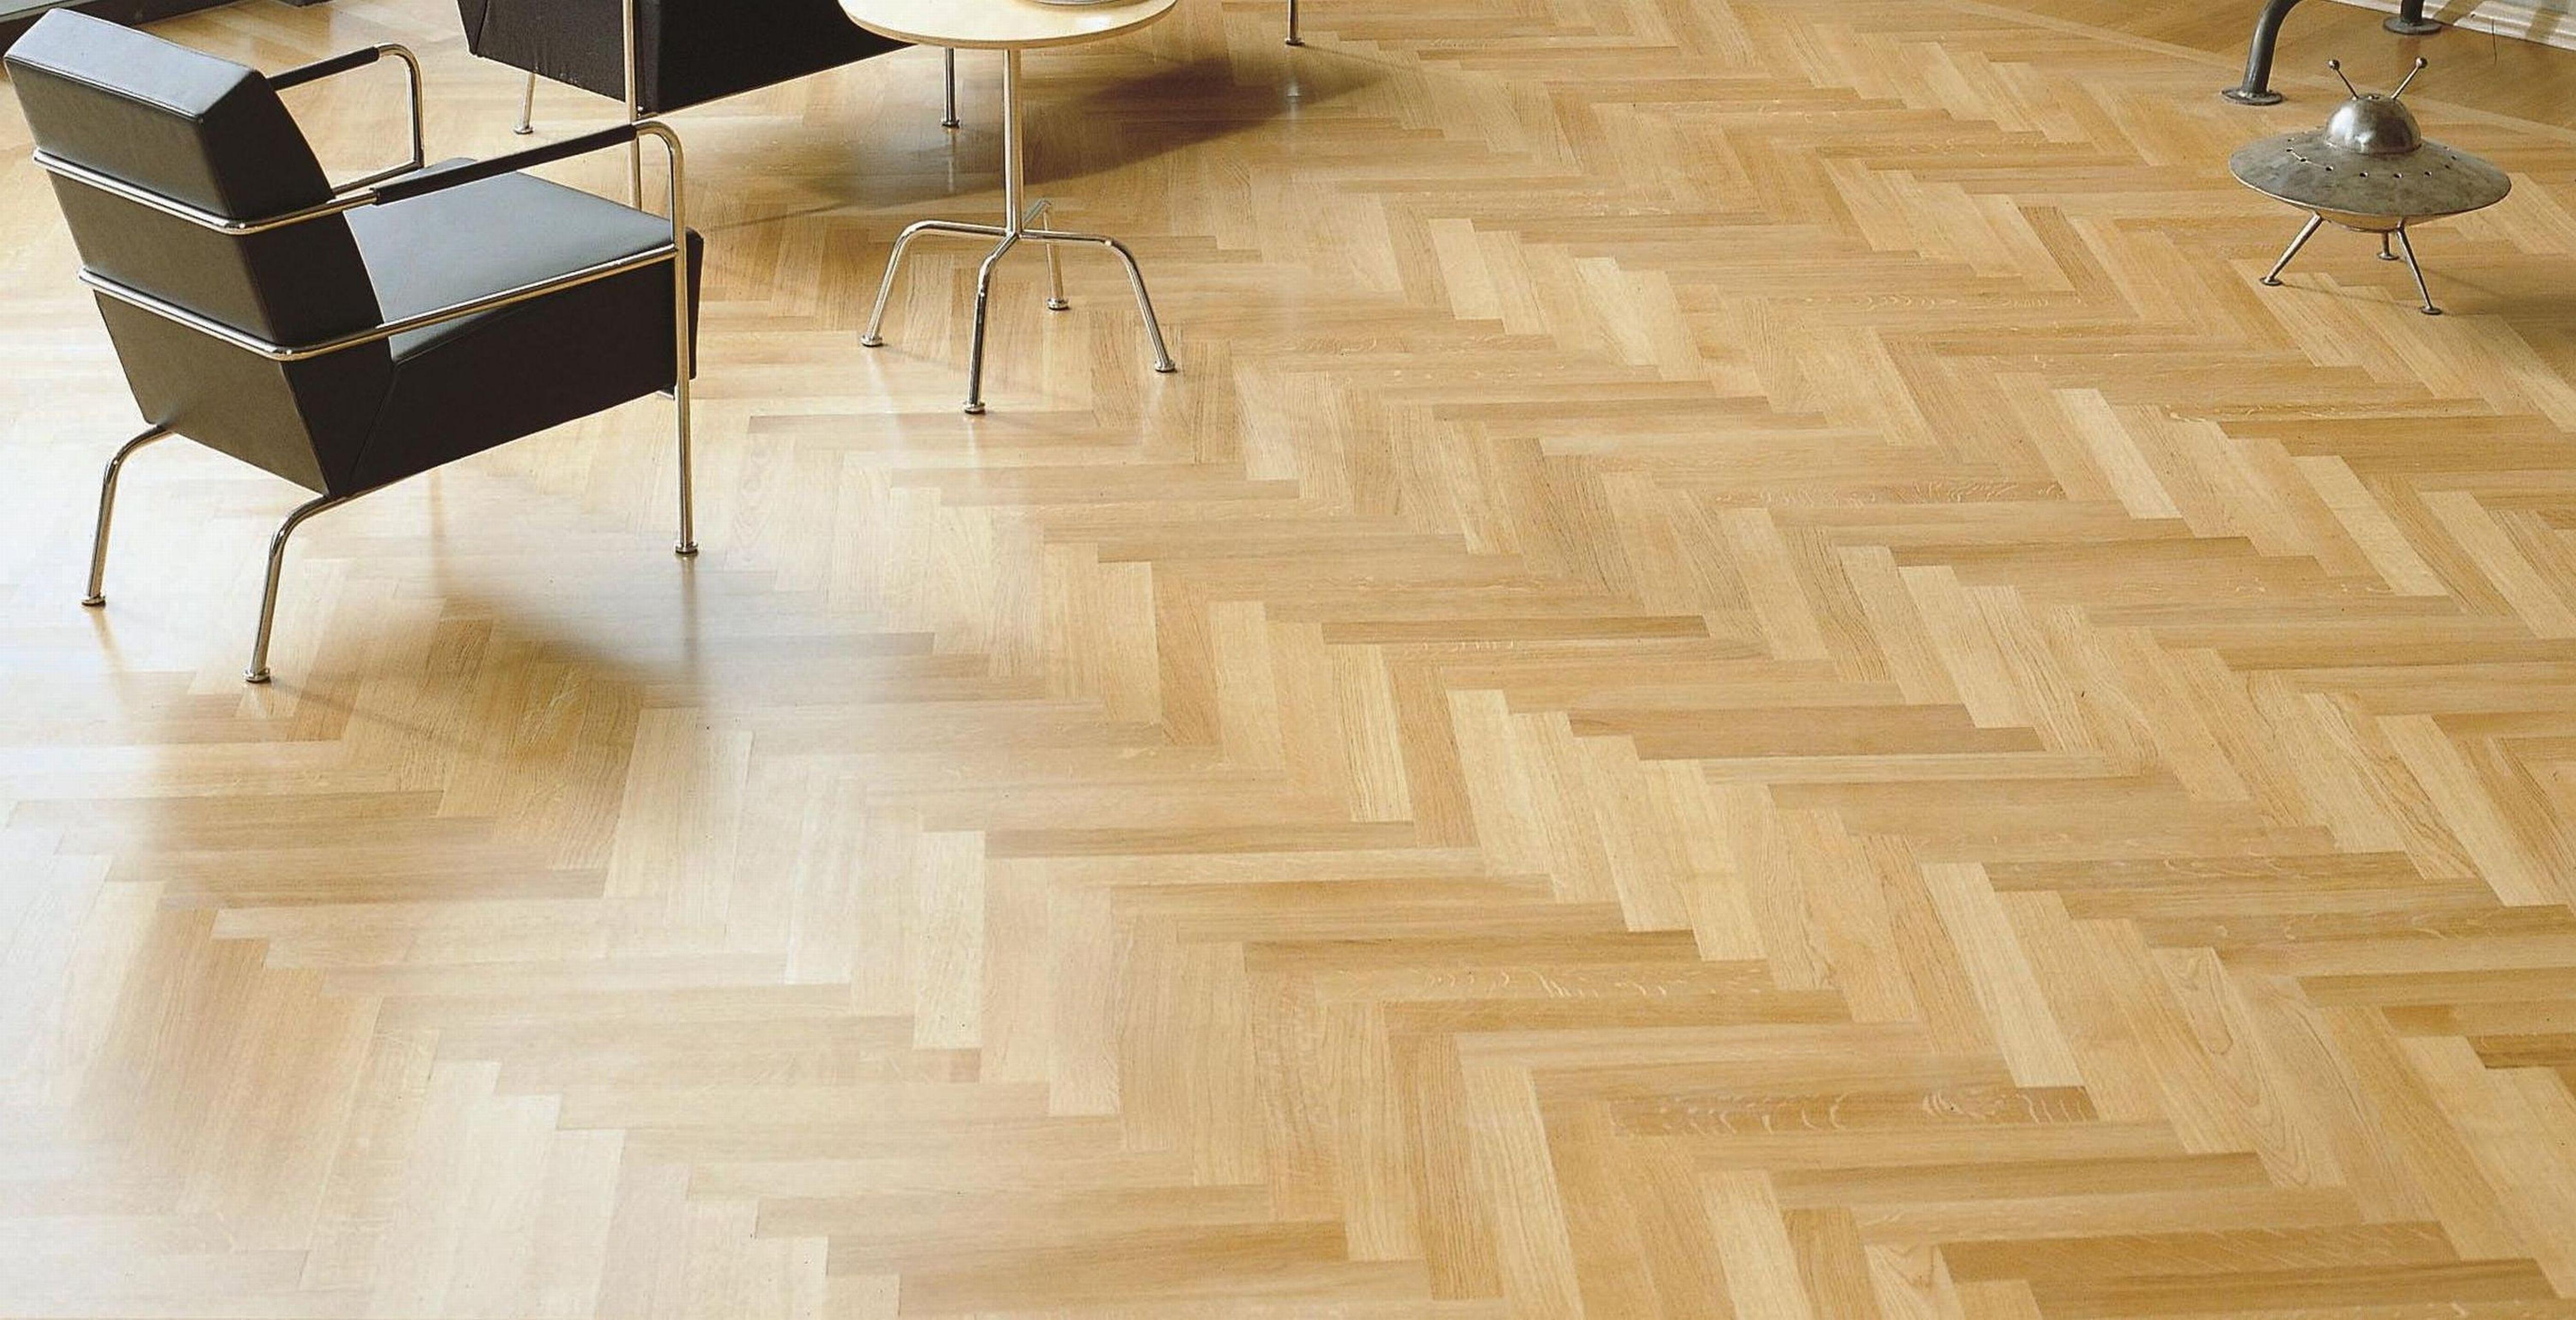 parquet wood flooring parquet flooring dubai wooden flooring dubaifurniture buy parquet wood floor  tiles NABPGUJ